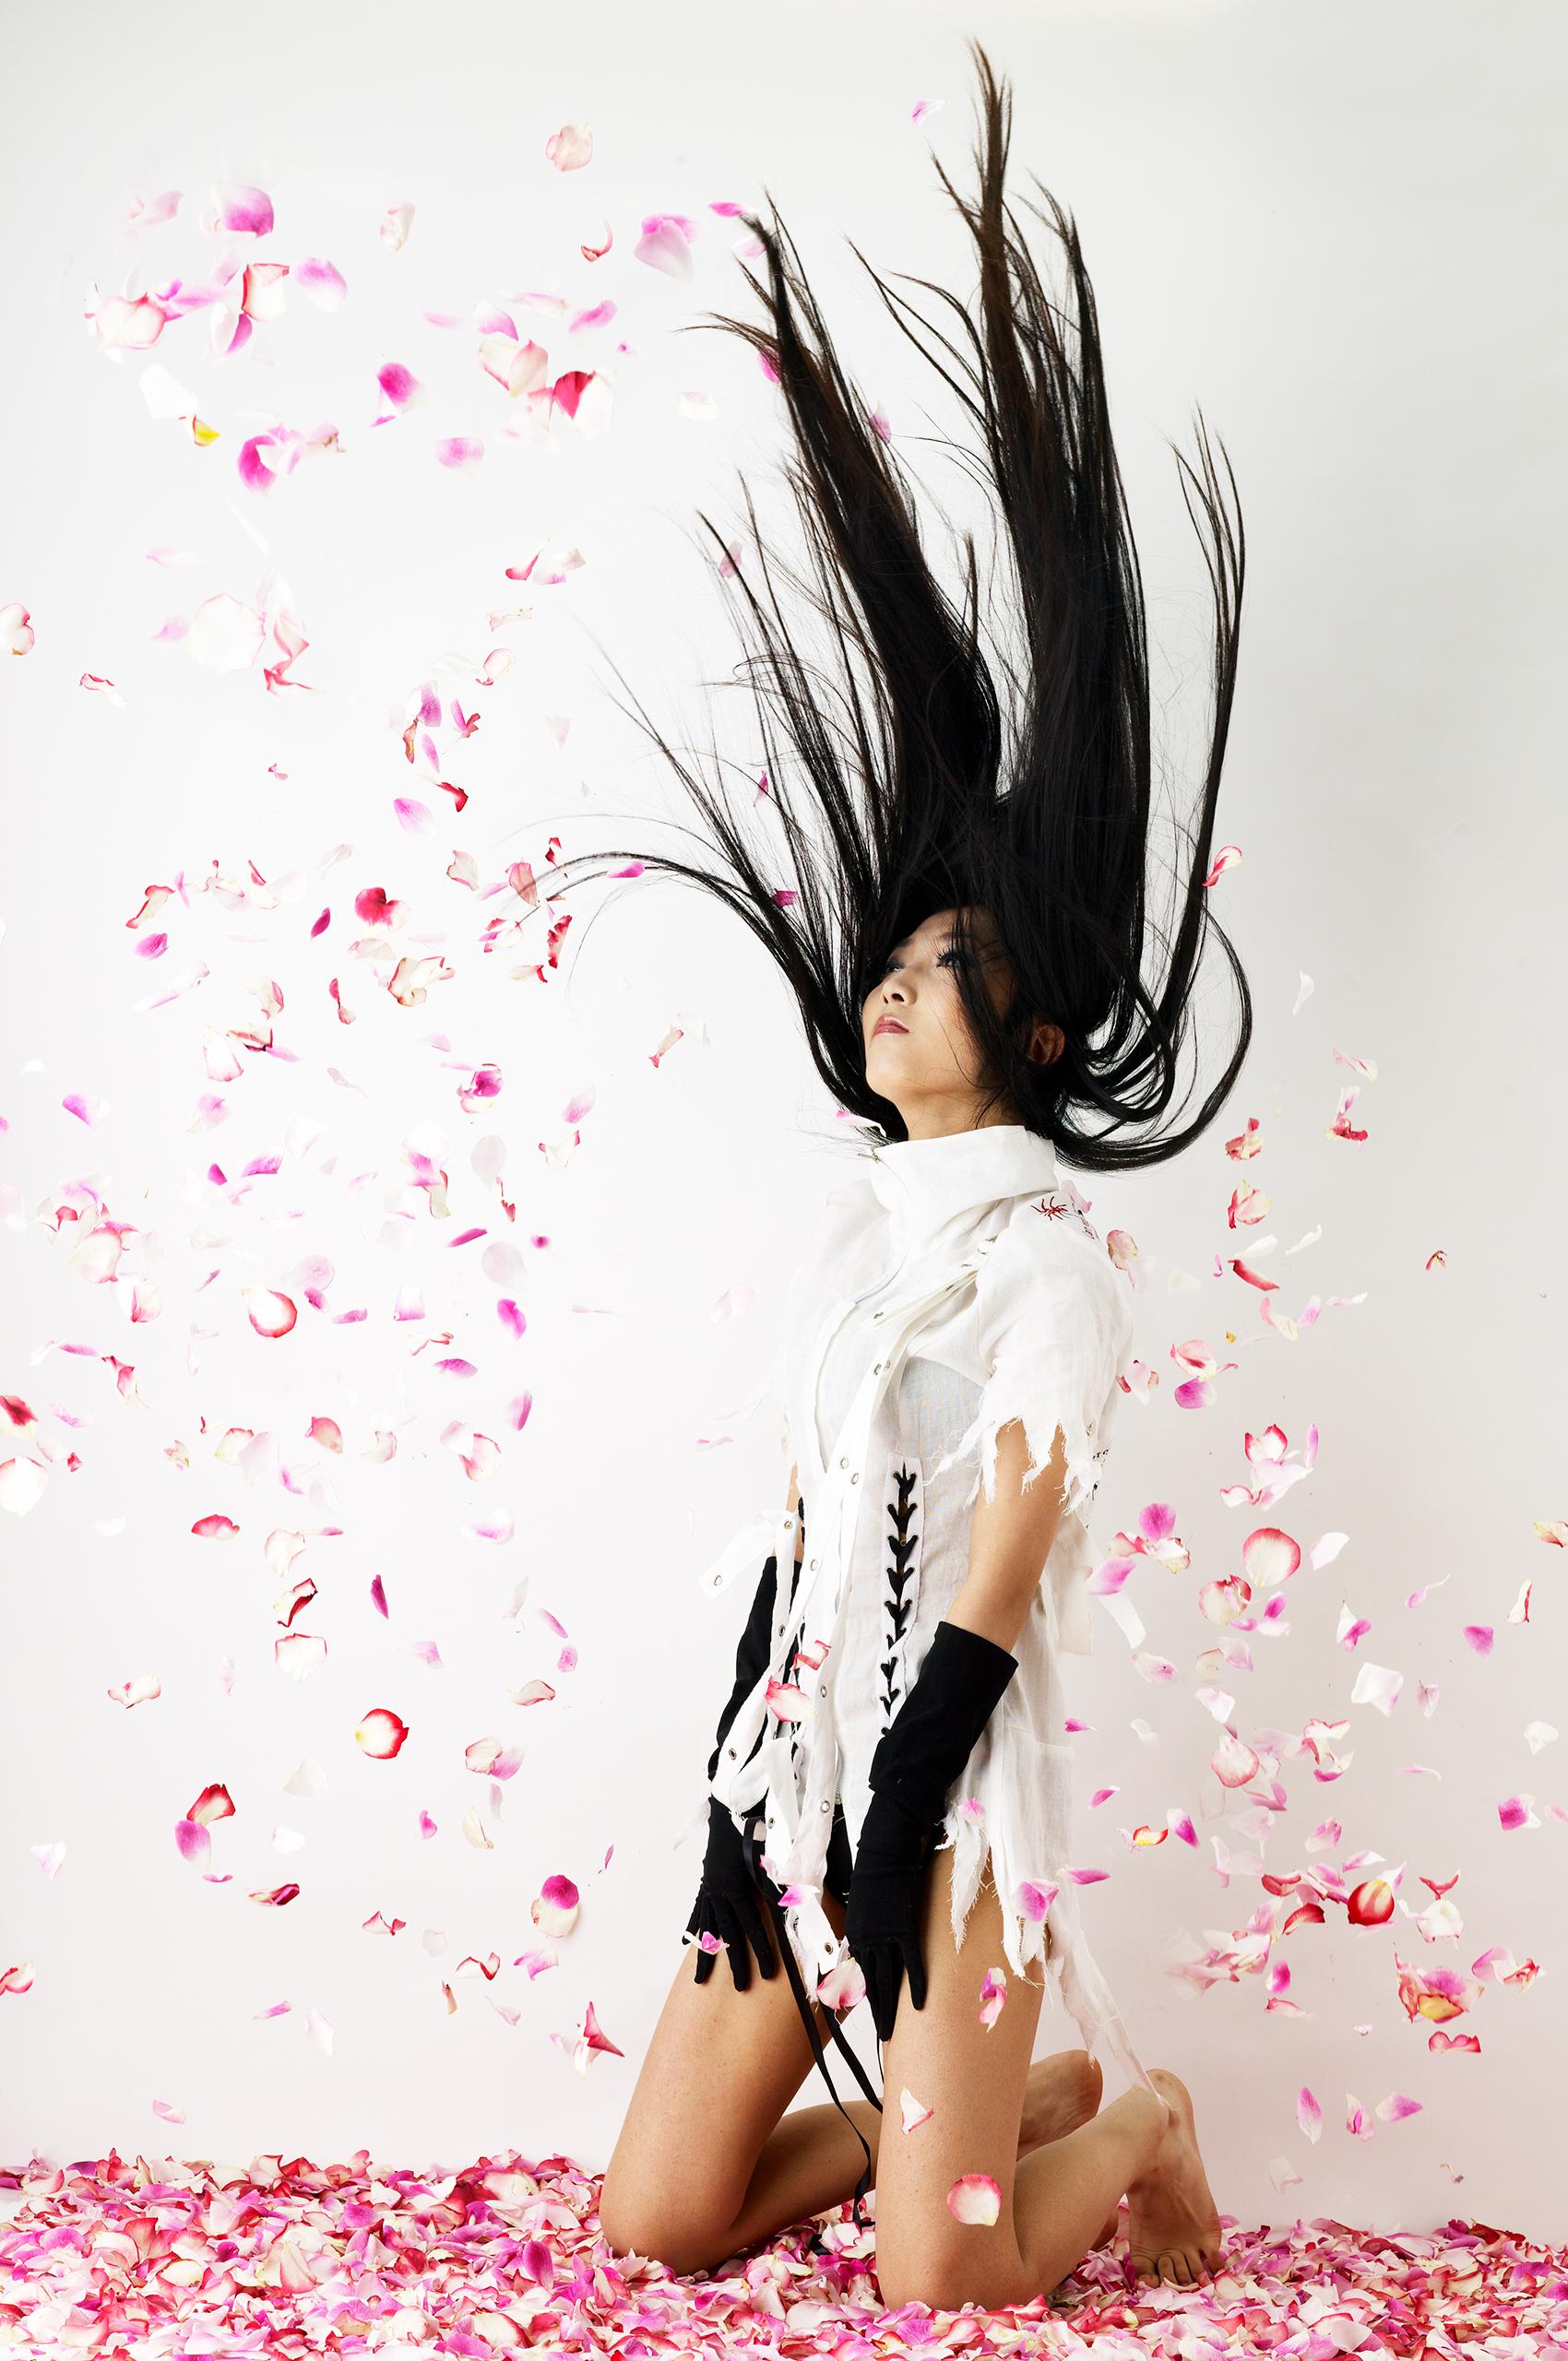 Roses and long hair